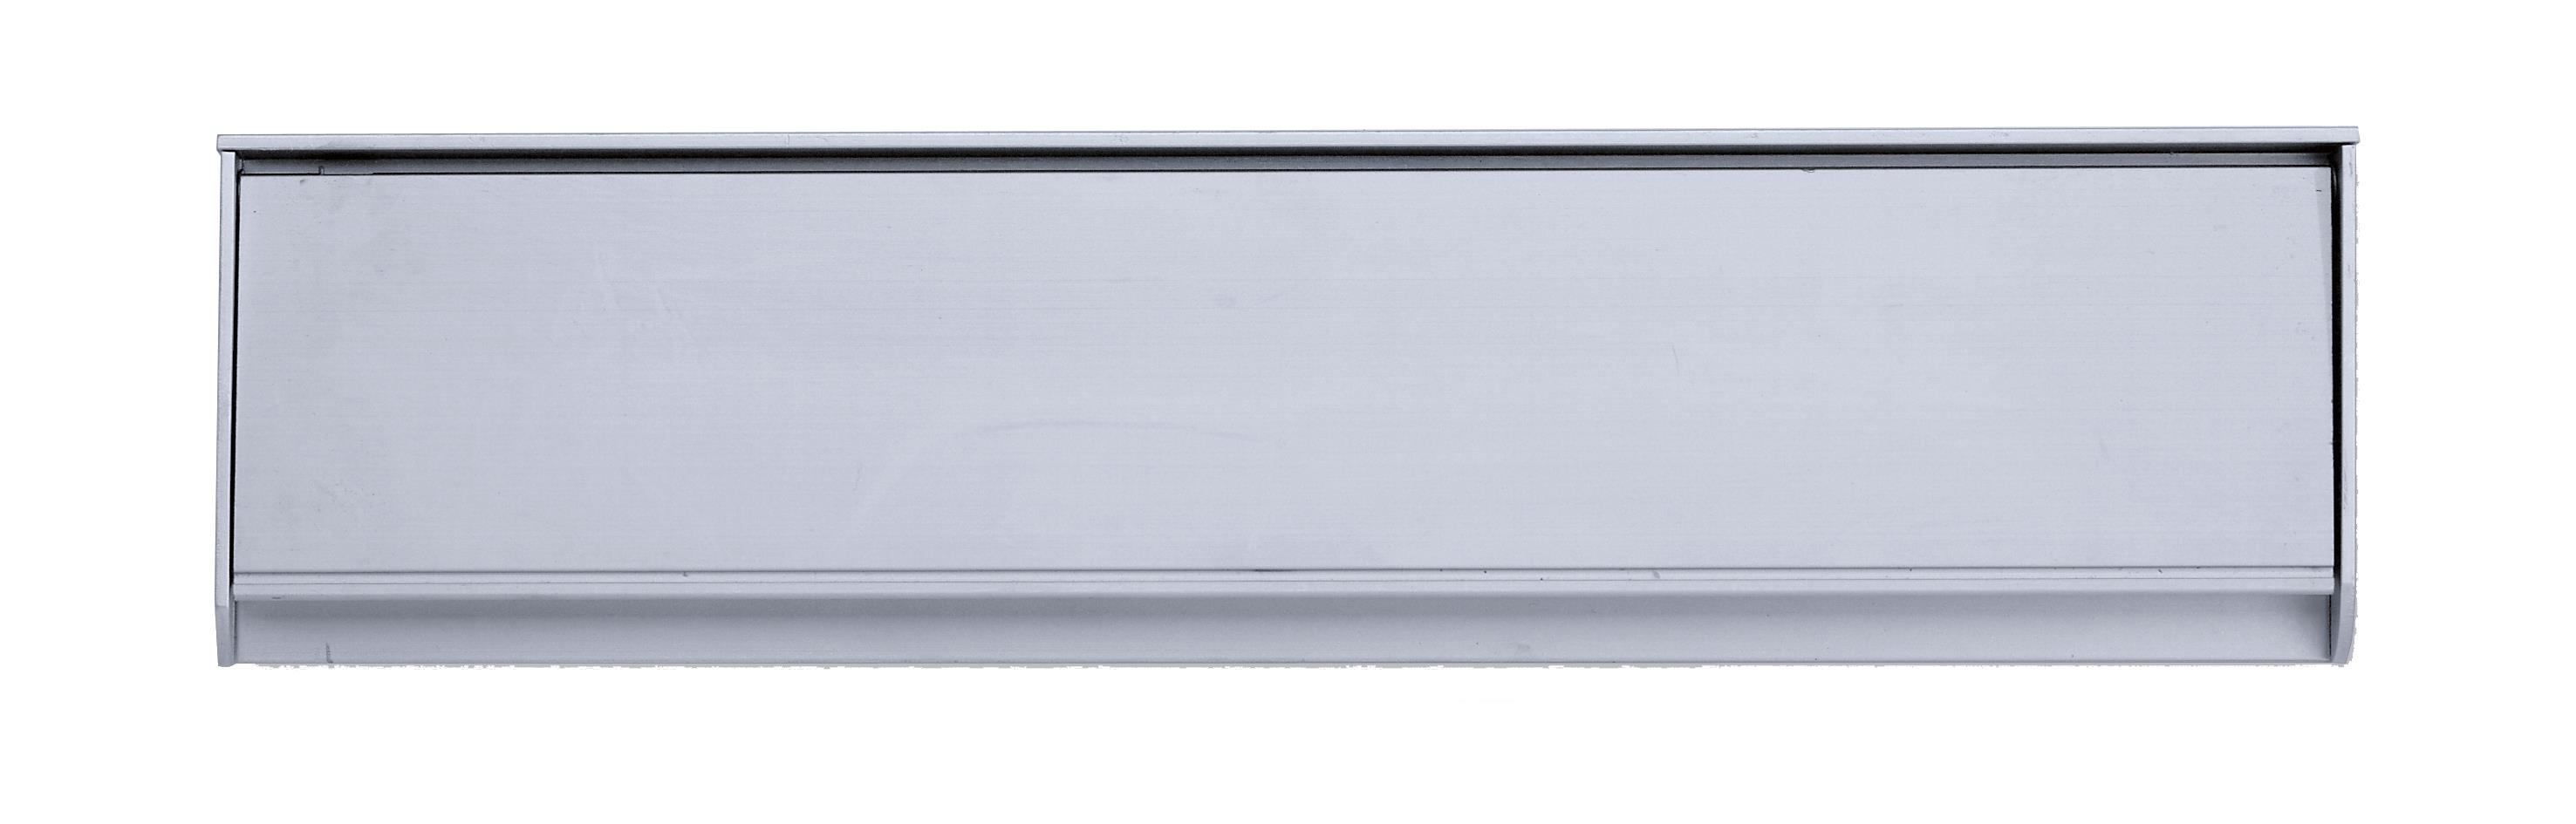 "6K10 - 10"" Concord Letter Plate (formerly Wellington range)"